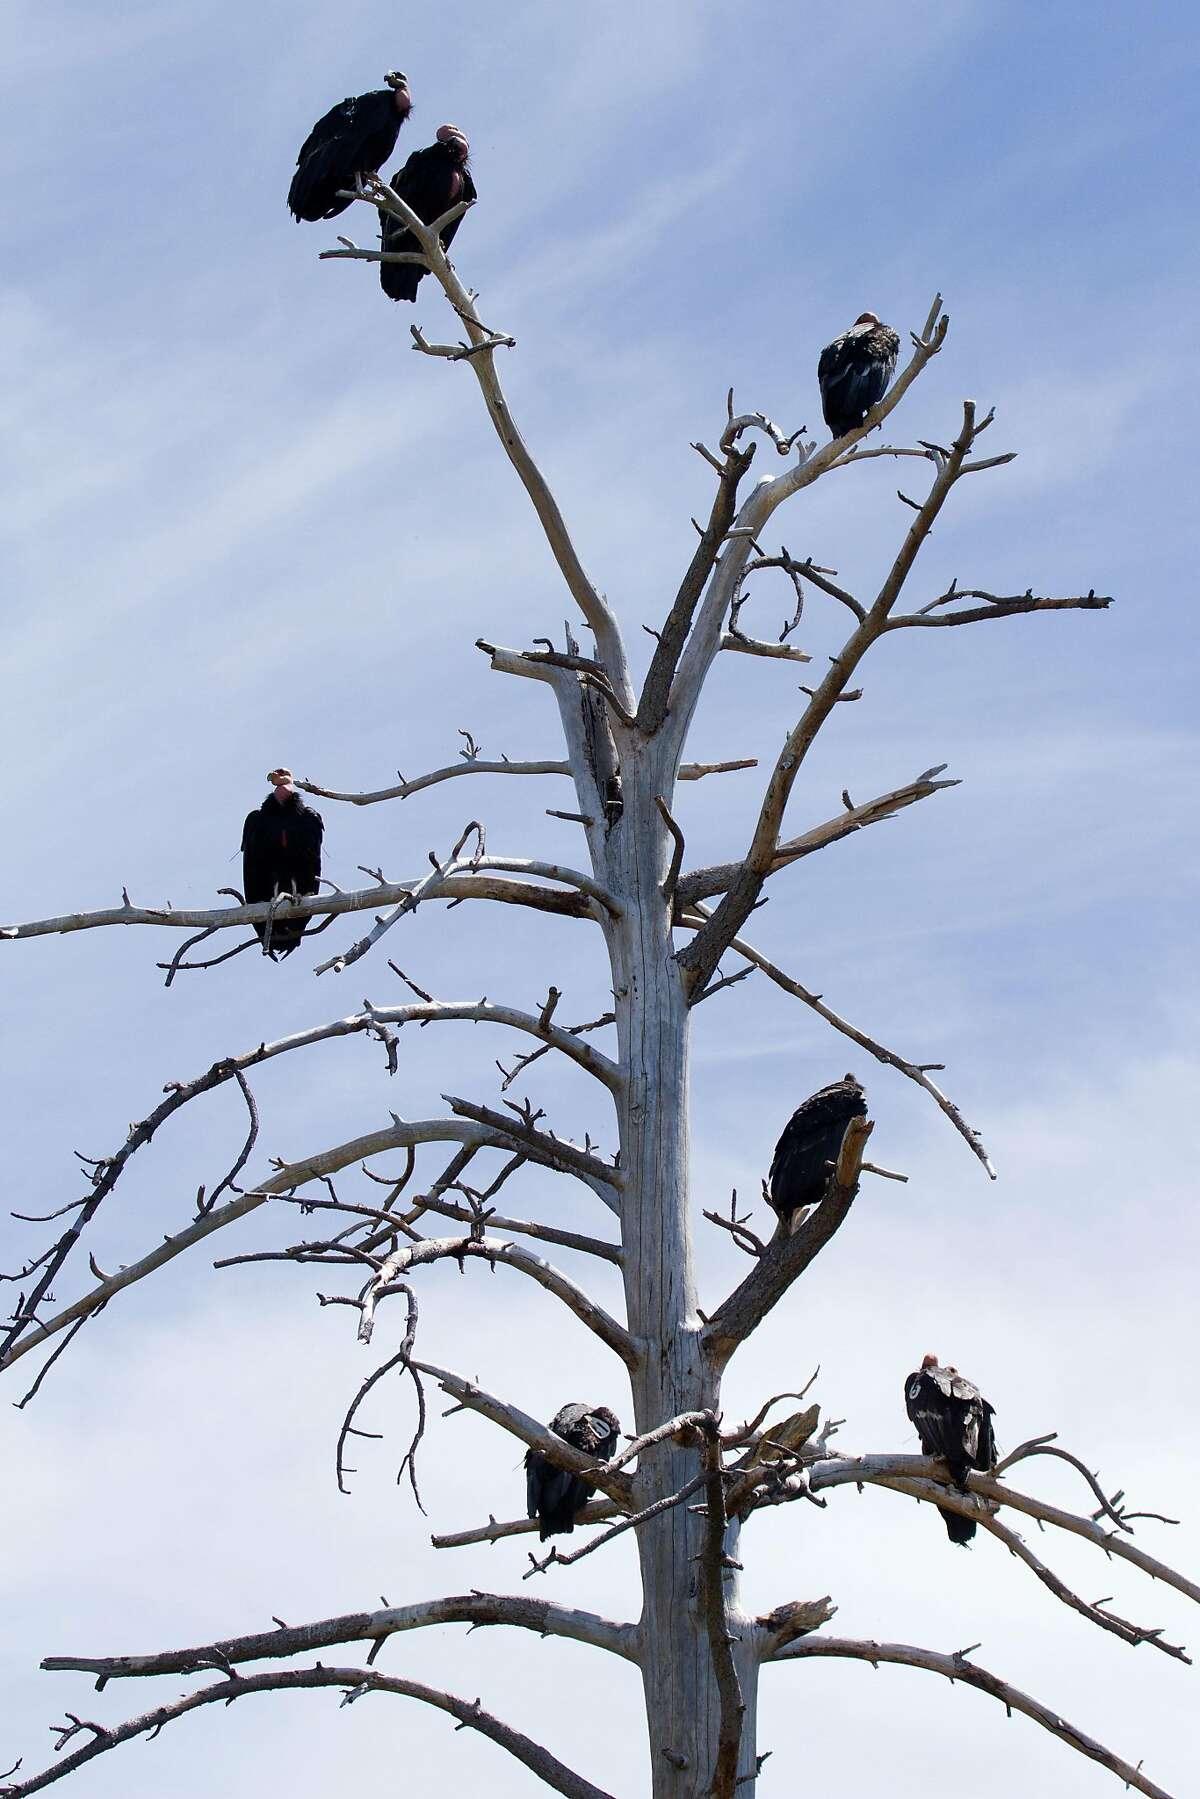 Condors roost in a dead tree in the Ventana Wildlife Society condor sanctuary high above the Big Sur coastline.